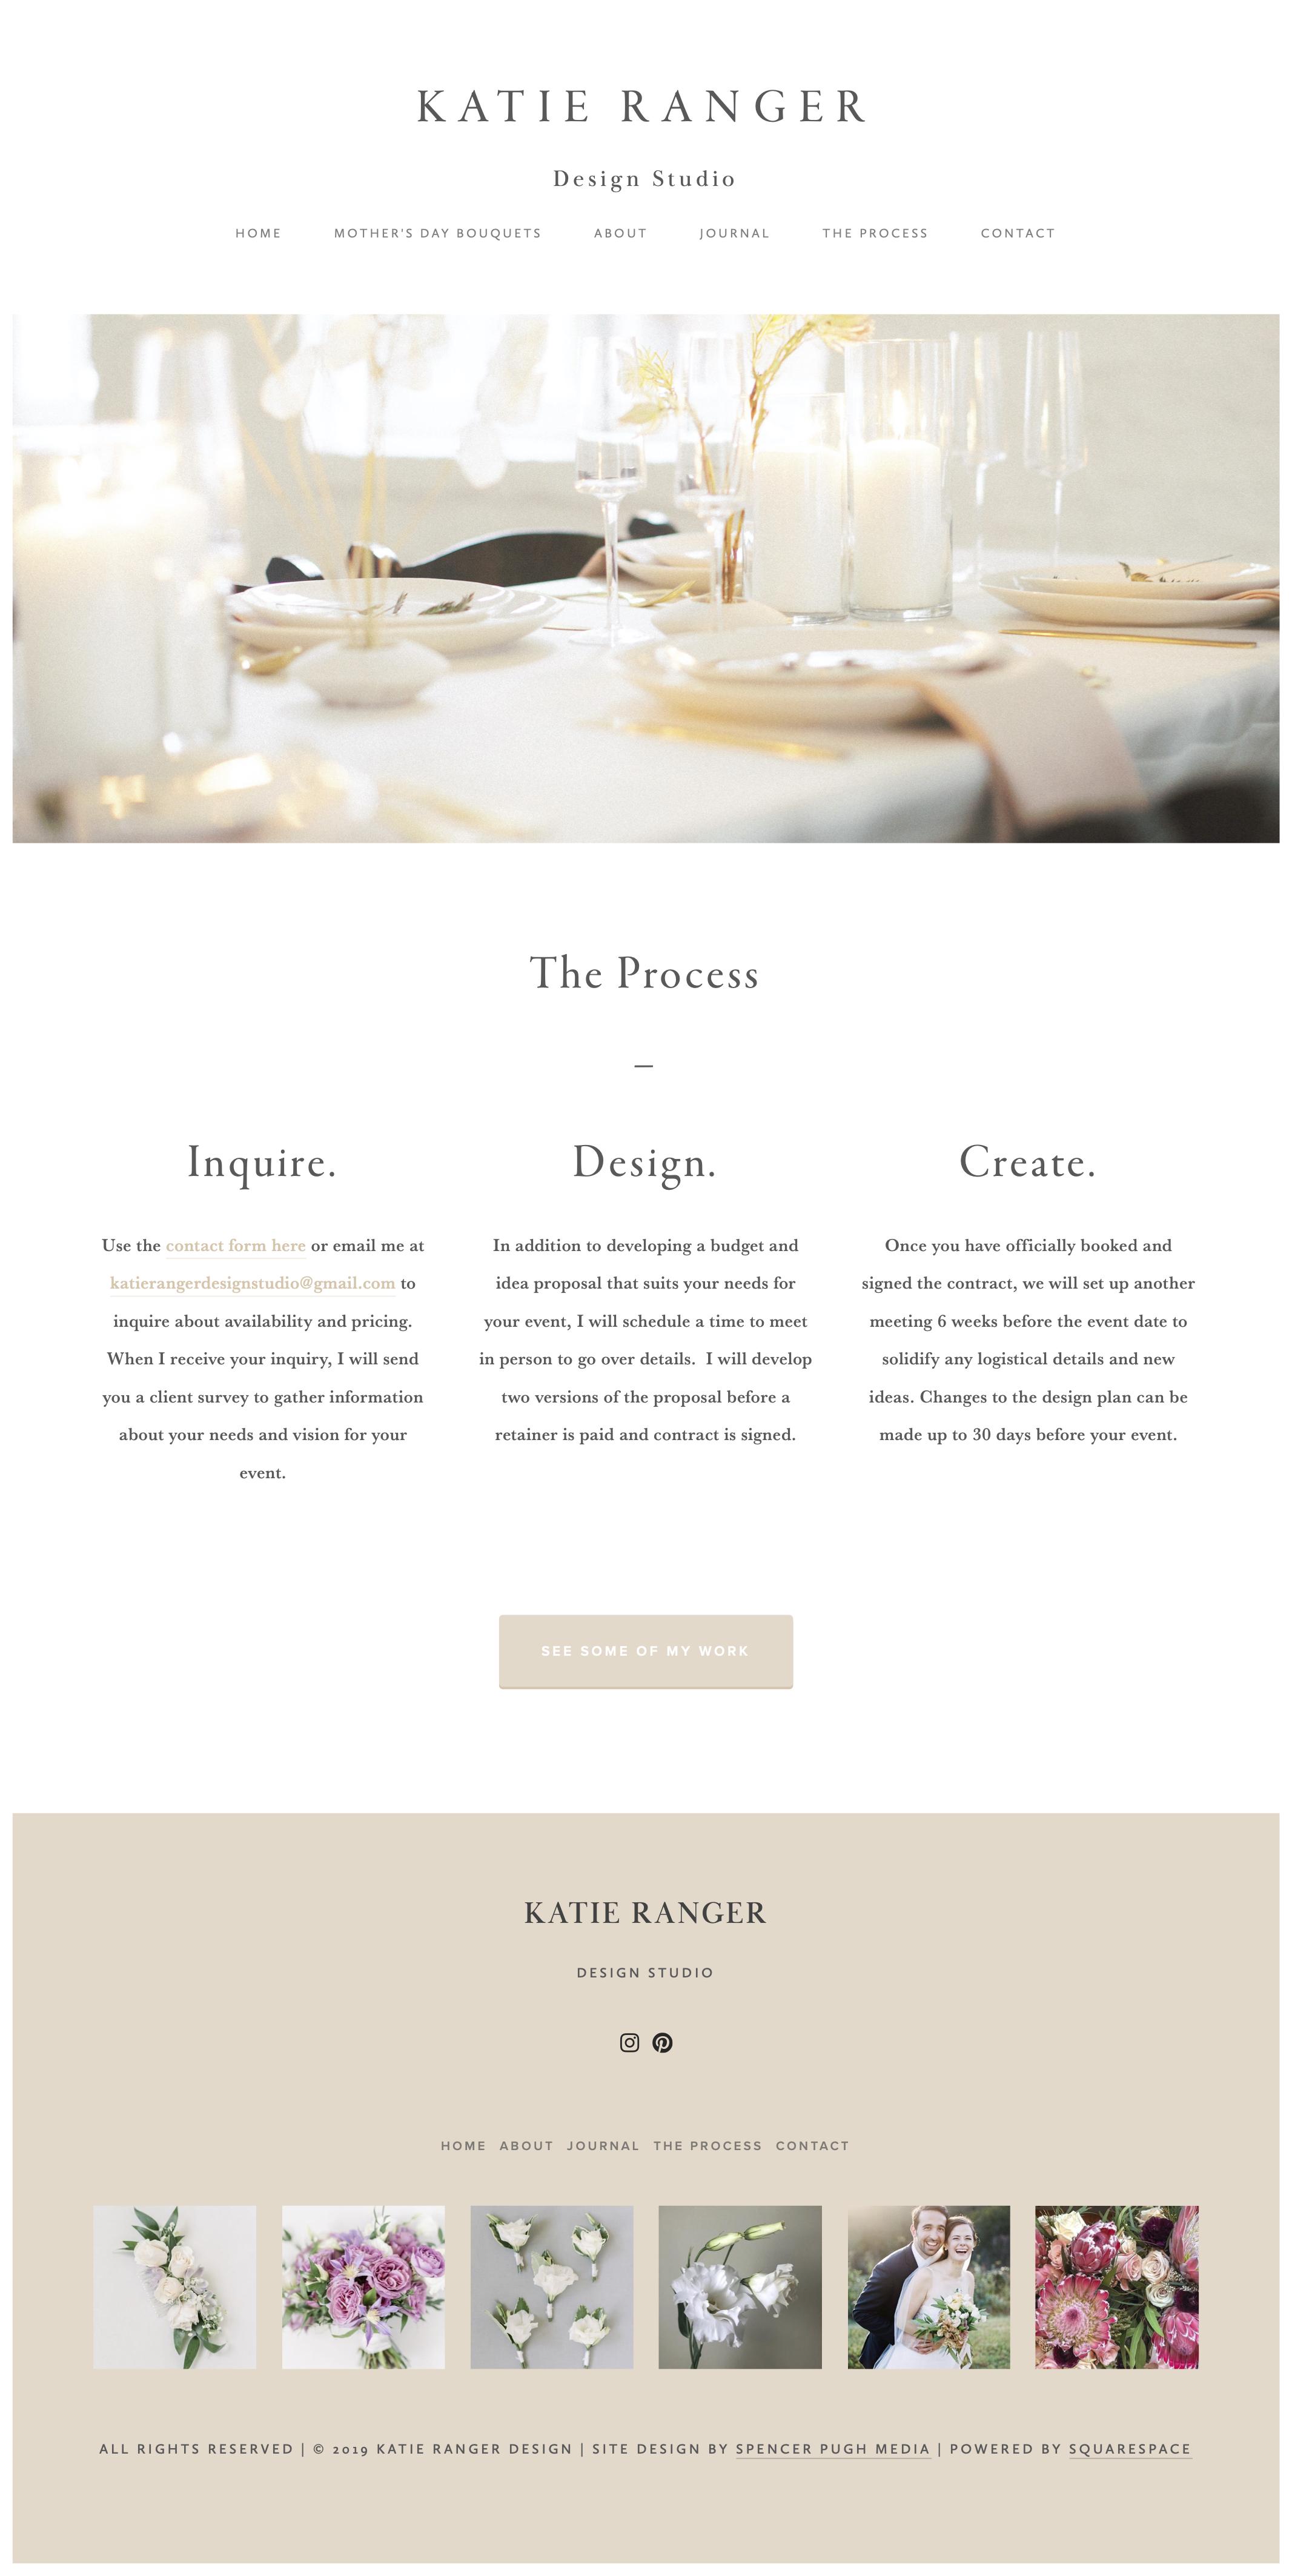 The Process — Katie Ranger.jpg